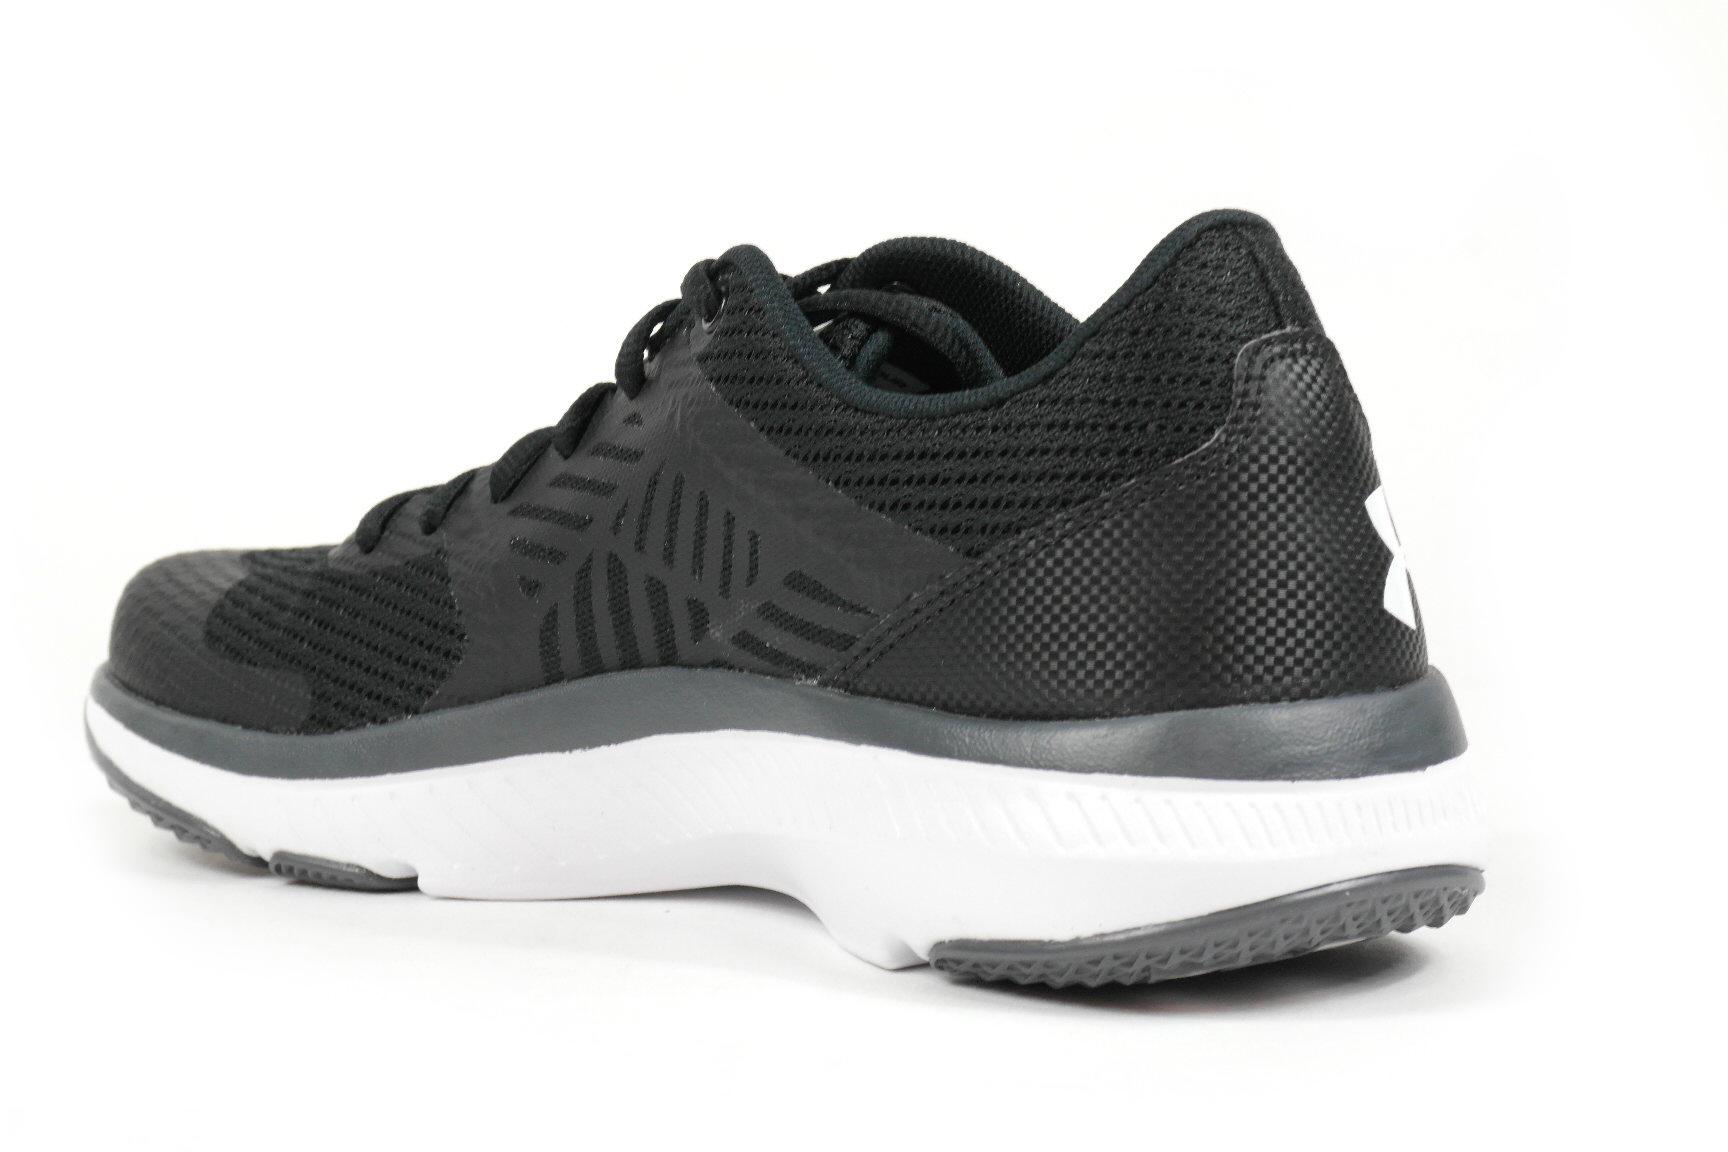 Noir Chaussures Underarmour A6EKd8k